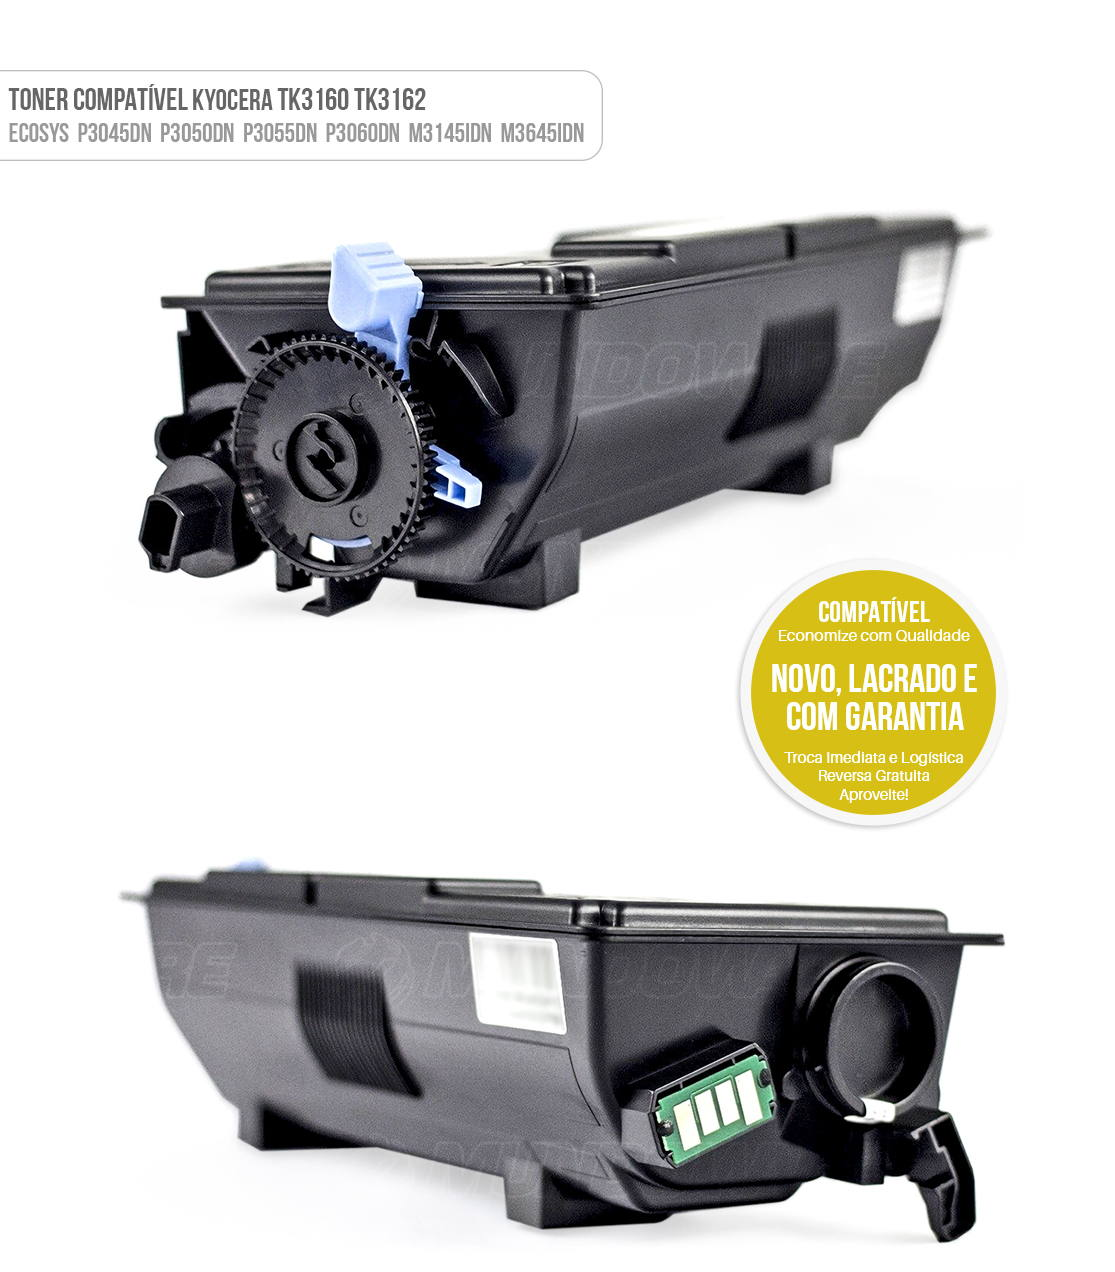 Toner TK3160 TK3162 para Impressora Kyocera P3045DN P3050DN P3055DN P3060DN M3145IDN M3645IDN Tonner Preto